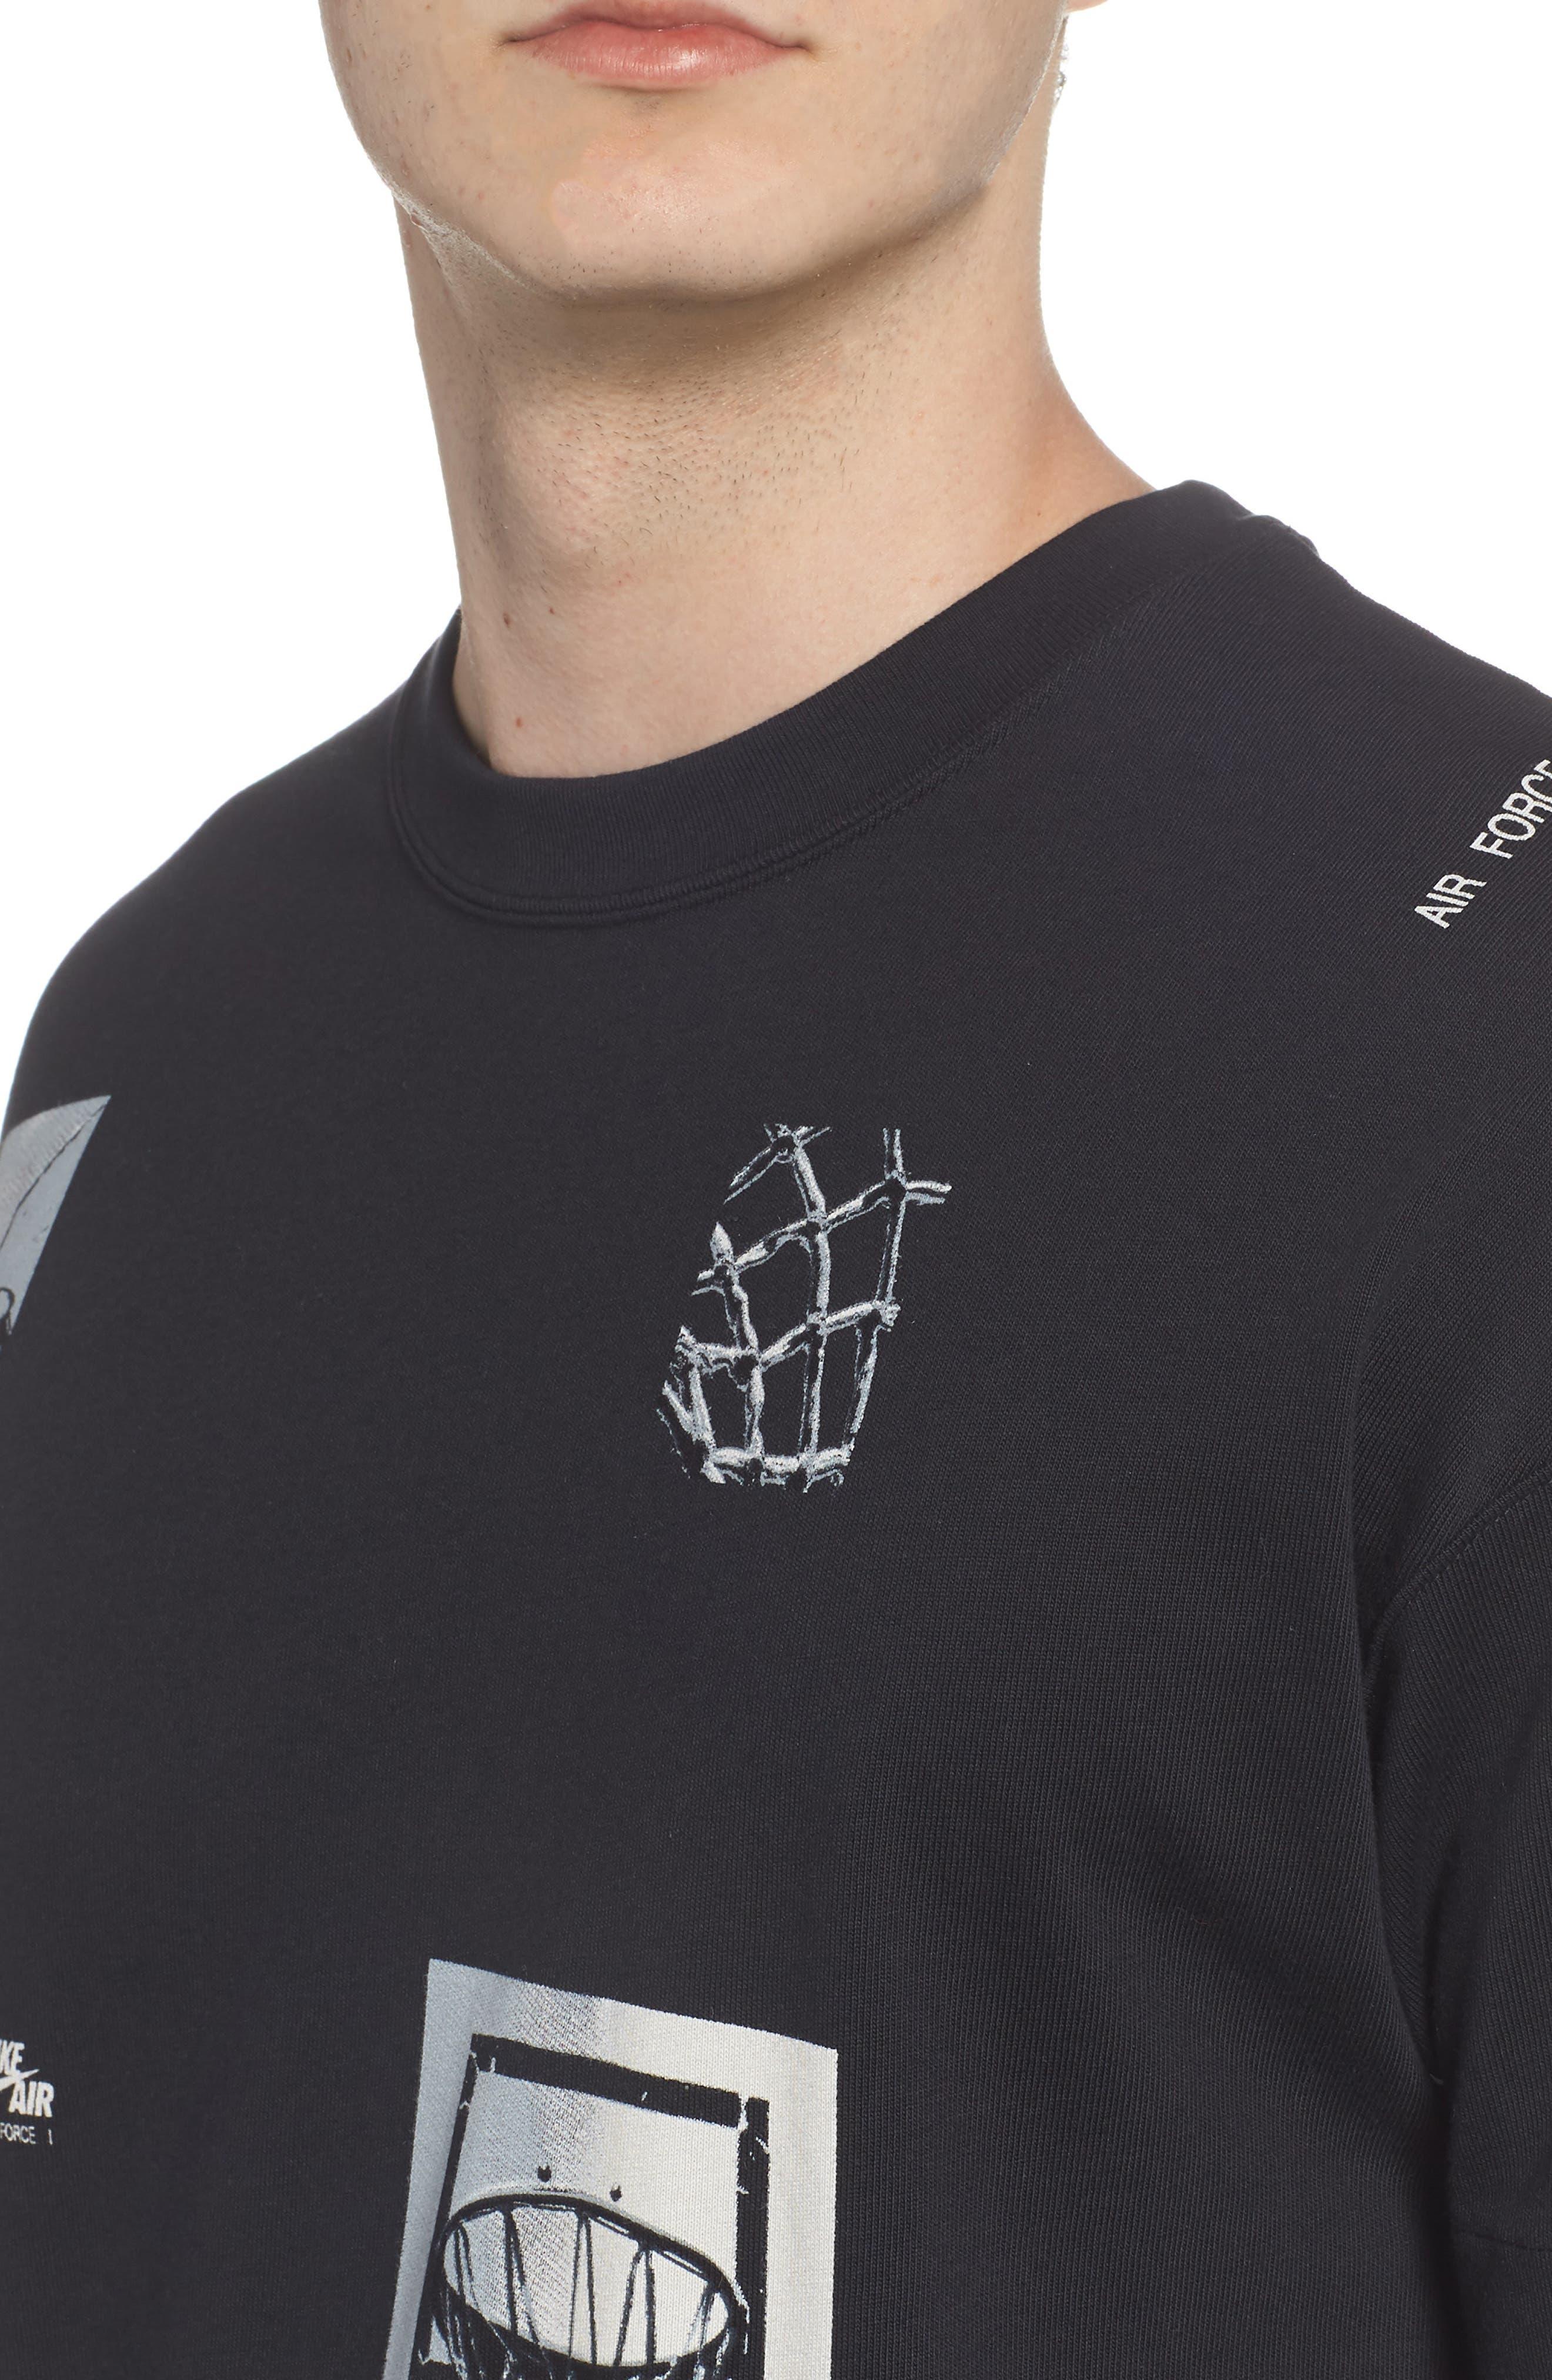 Sportswear AF-1 Oversize T-Shirt,                             Alternate thumbnail 4, color,                             Black/ White